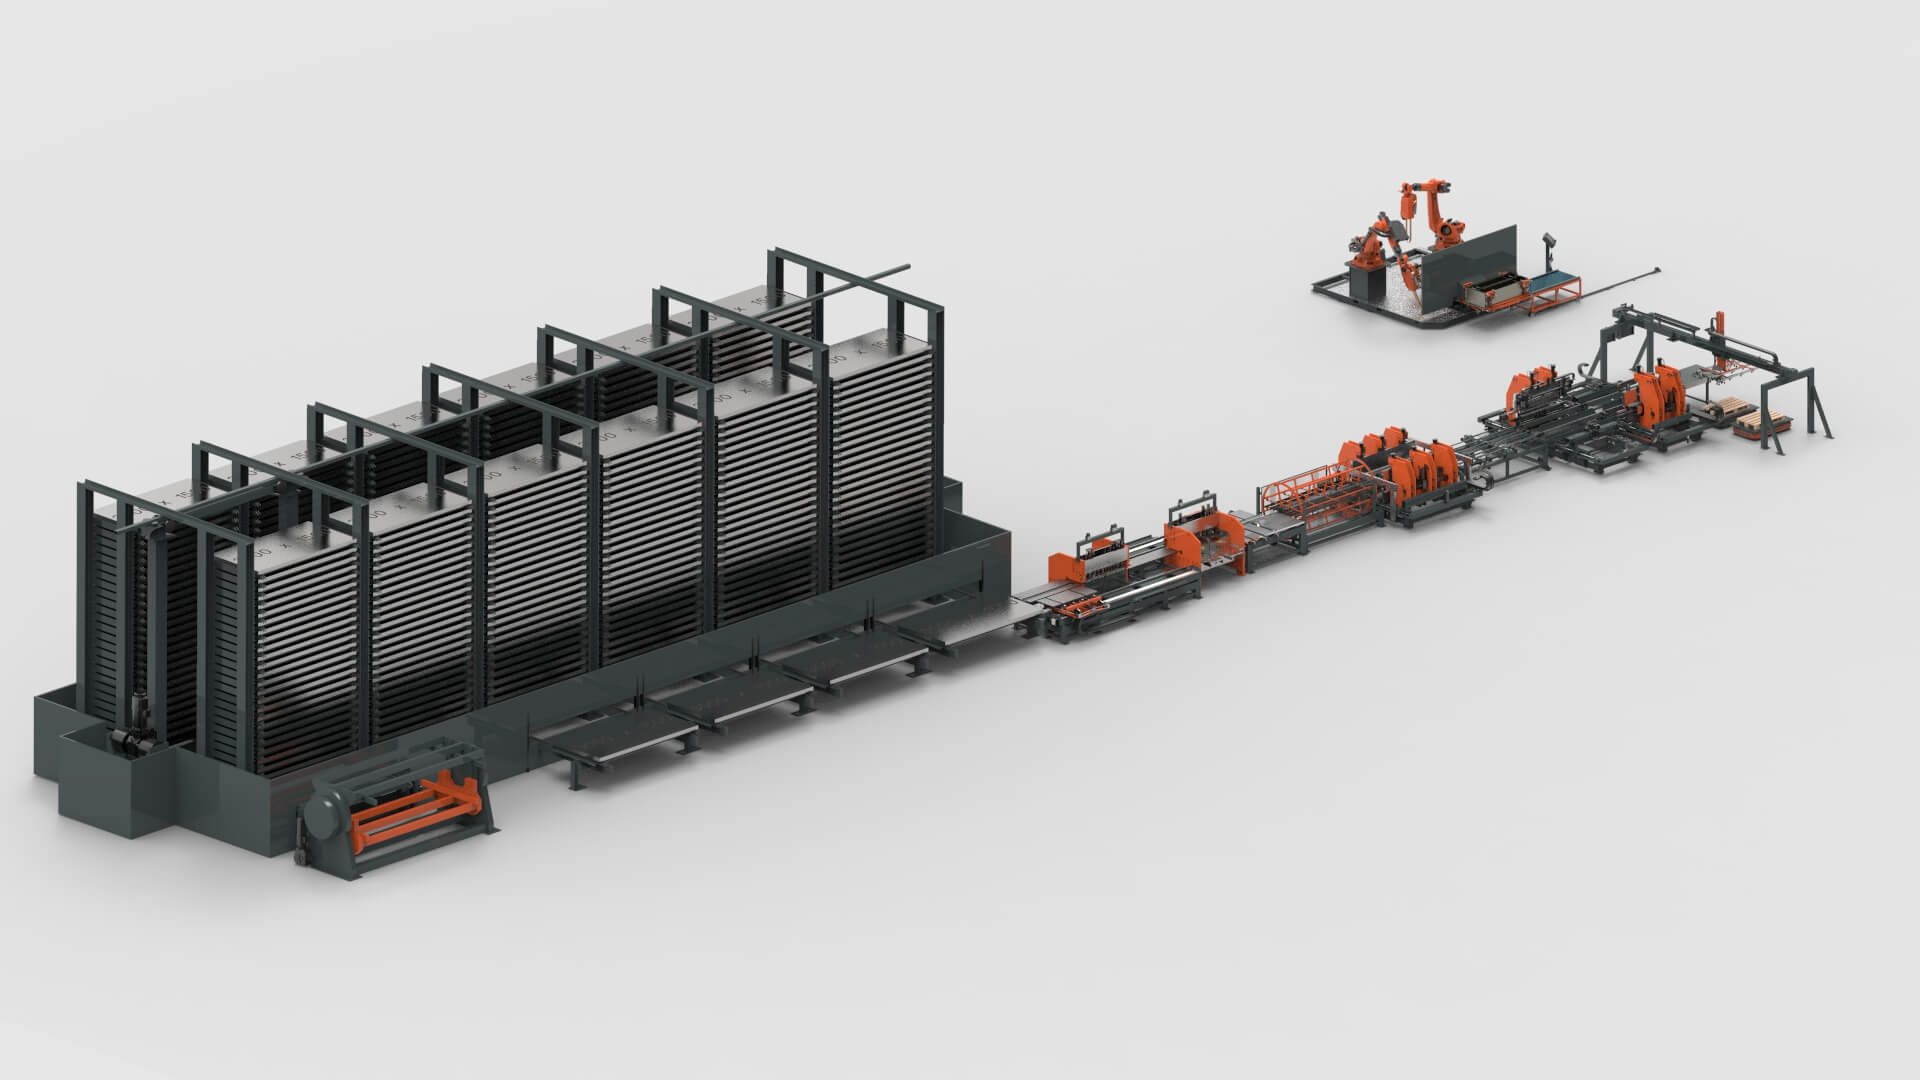 wemo-steel-cabinets-sheet-metal-storage-system-punching-bending-production-line.jpg